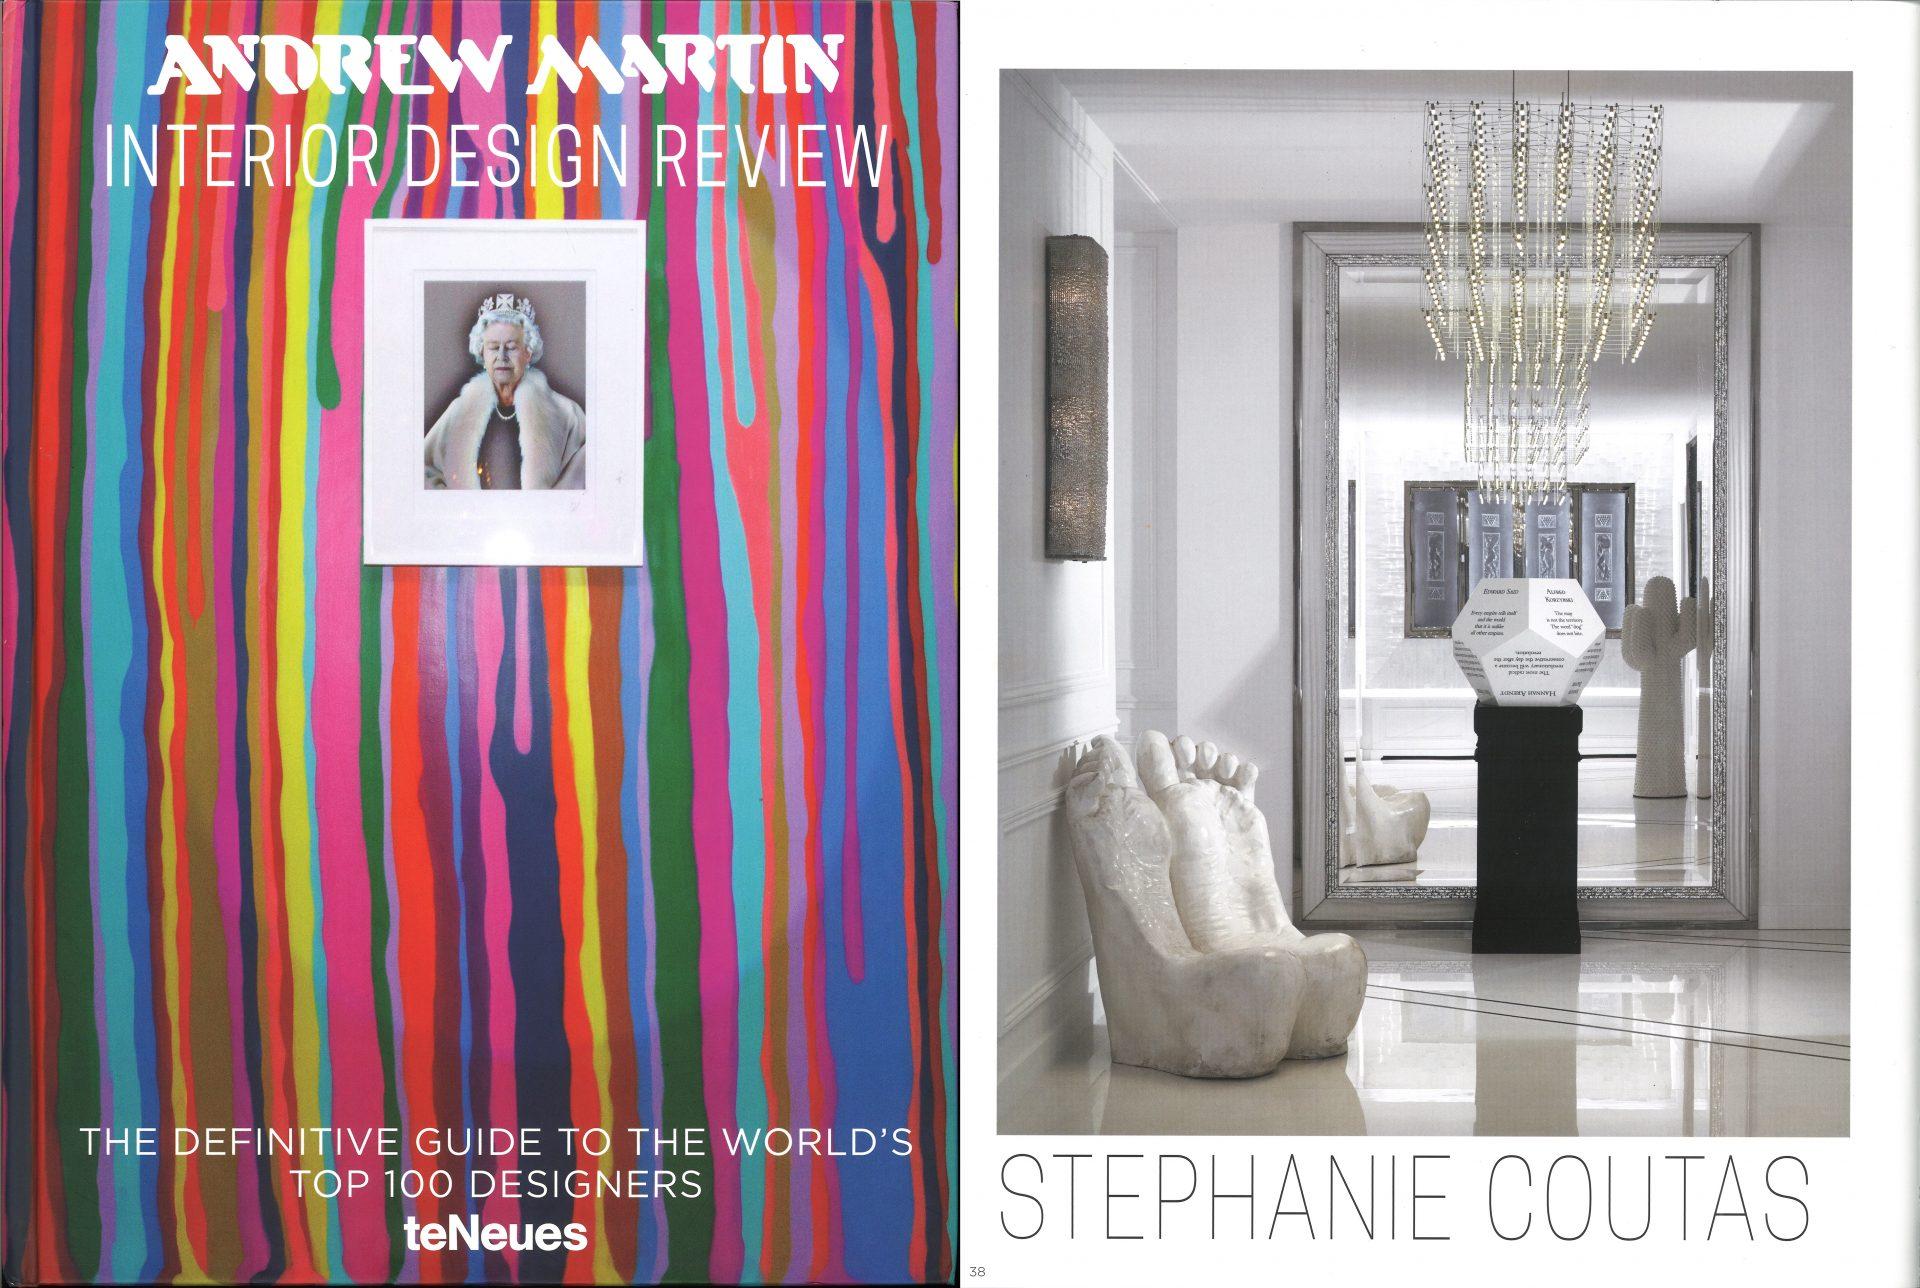 Andrew Martin Interior Designe Aa-ward- Stephanie Coutas